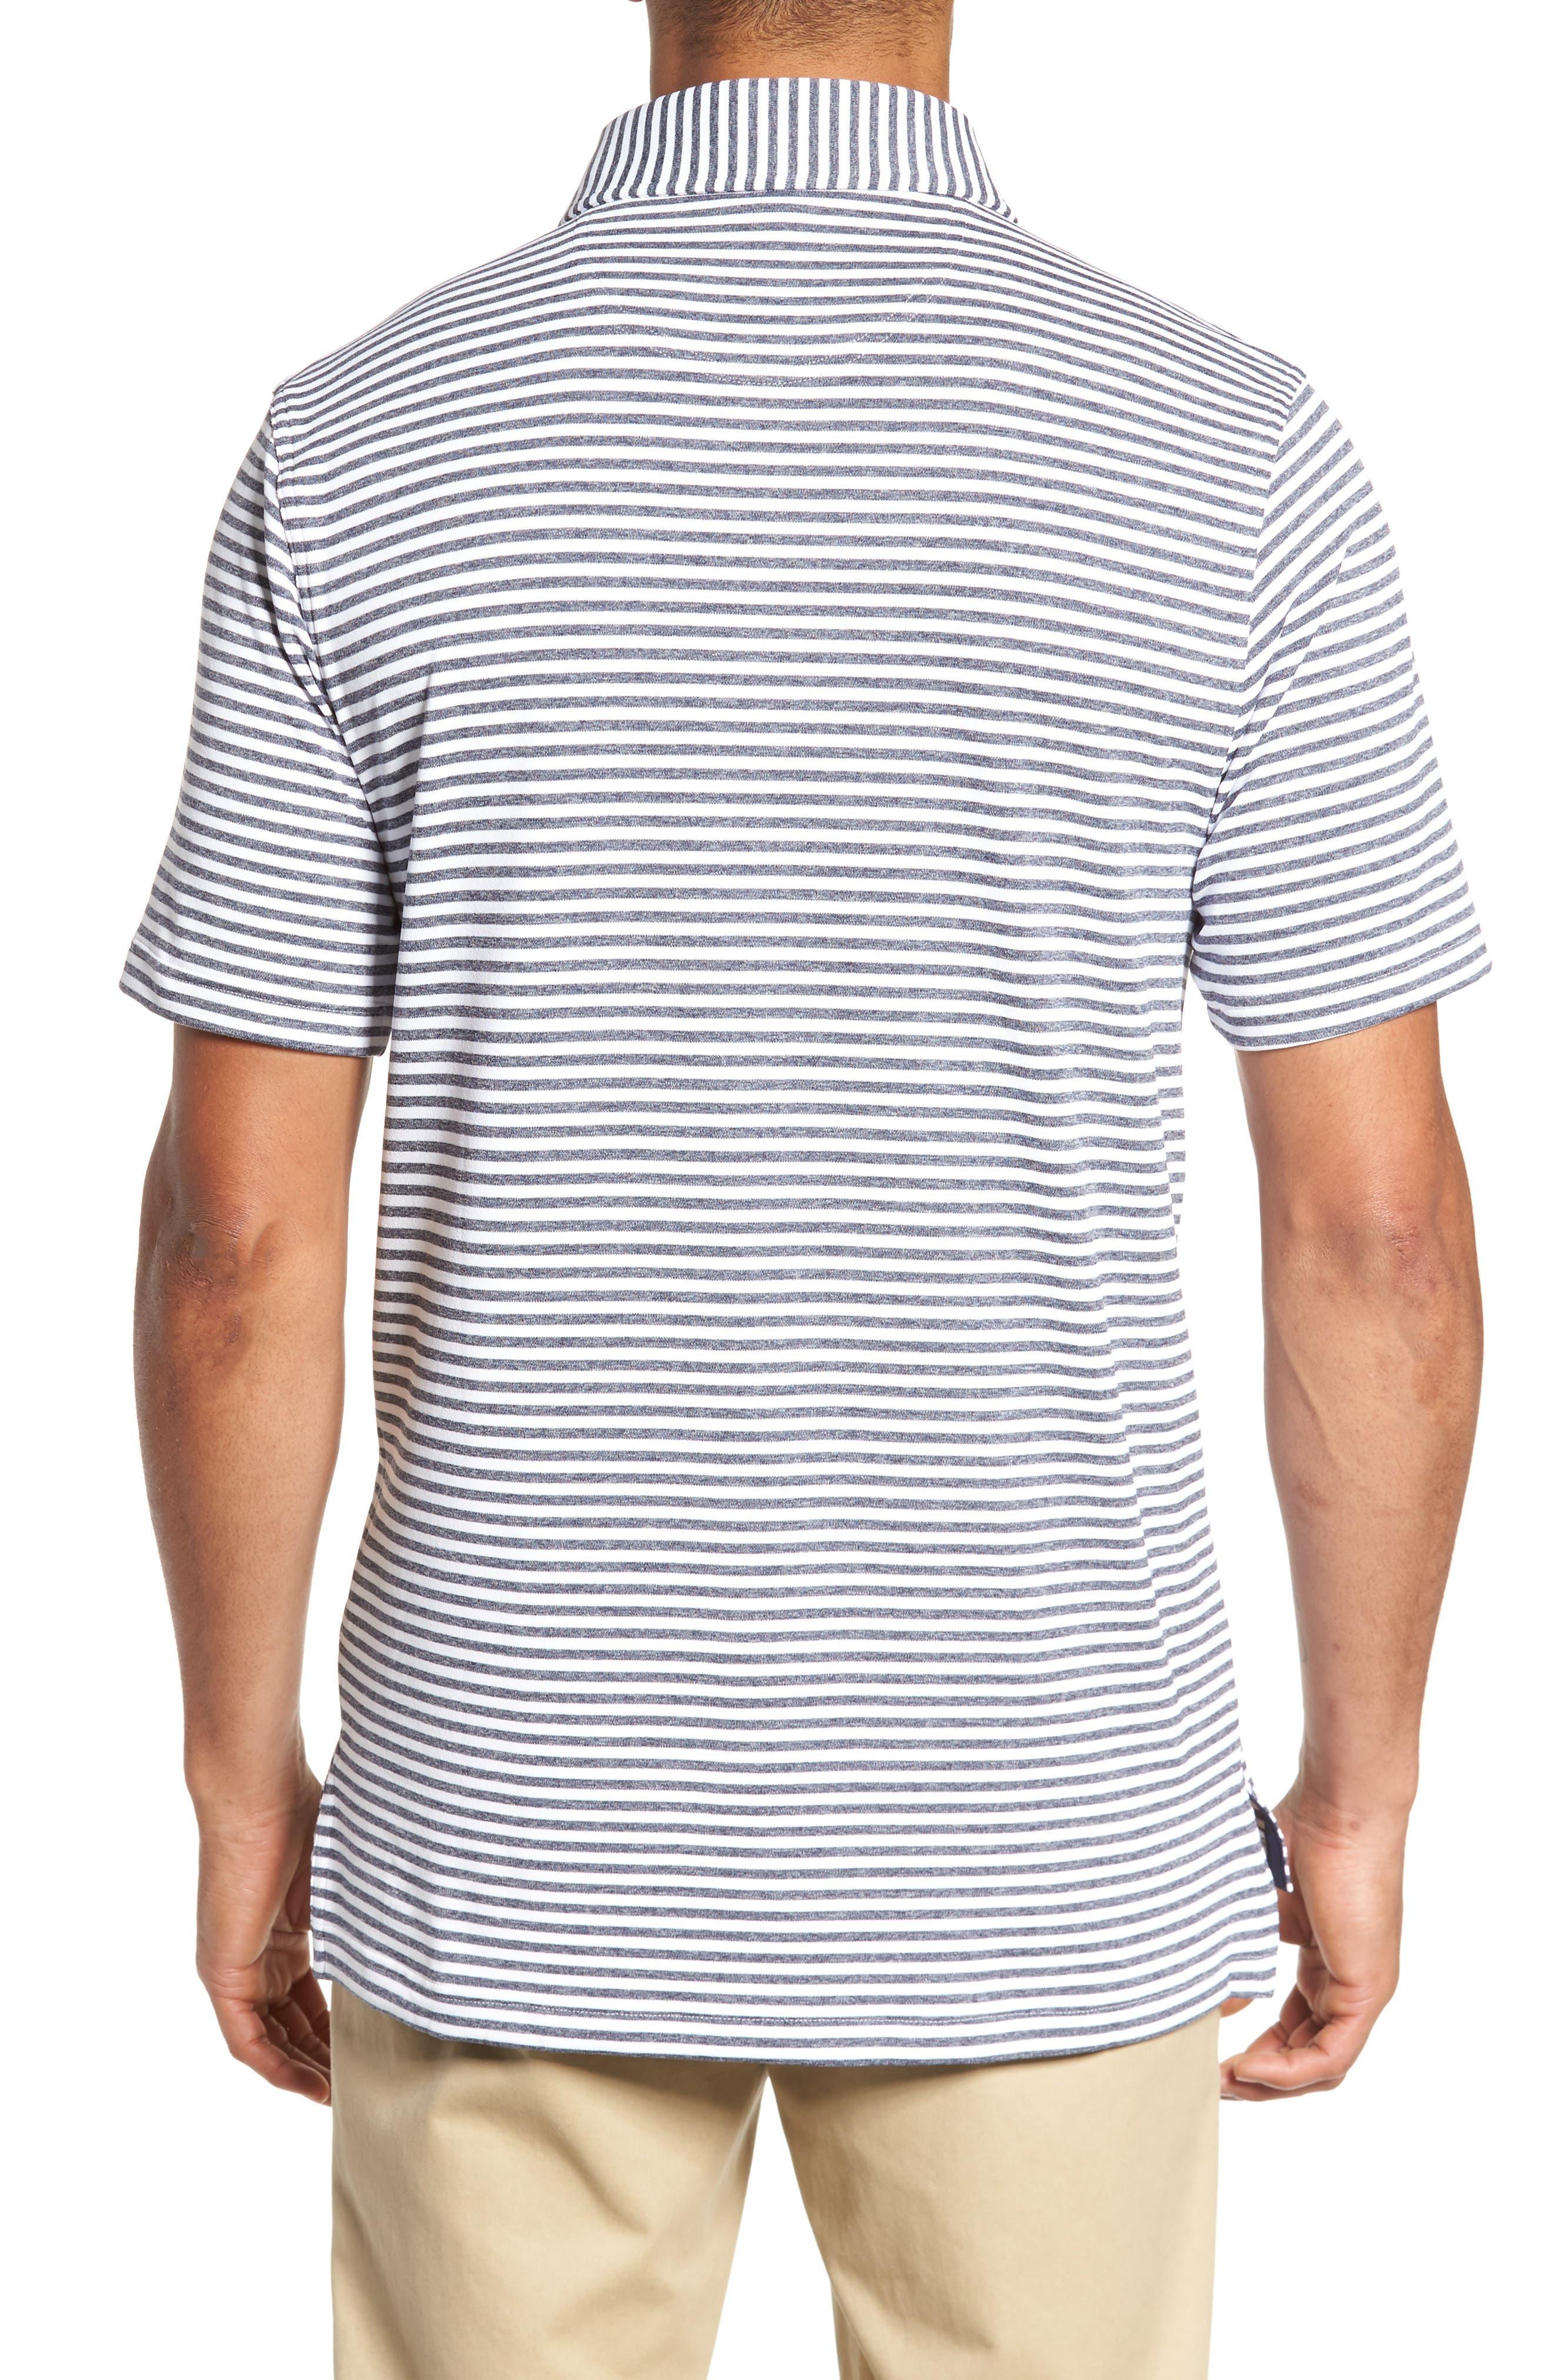 XH2O Tranquil Stripe Jersey Polo,                             Alternate thumbnail 2, color,                             White